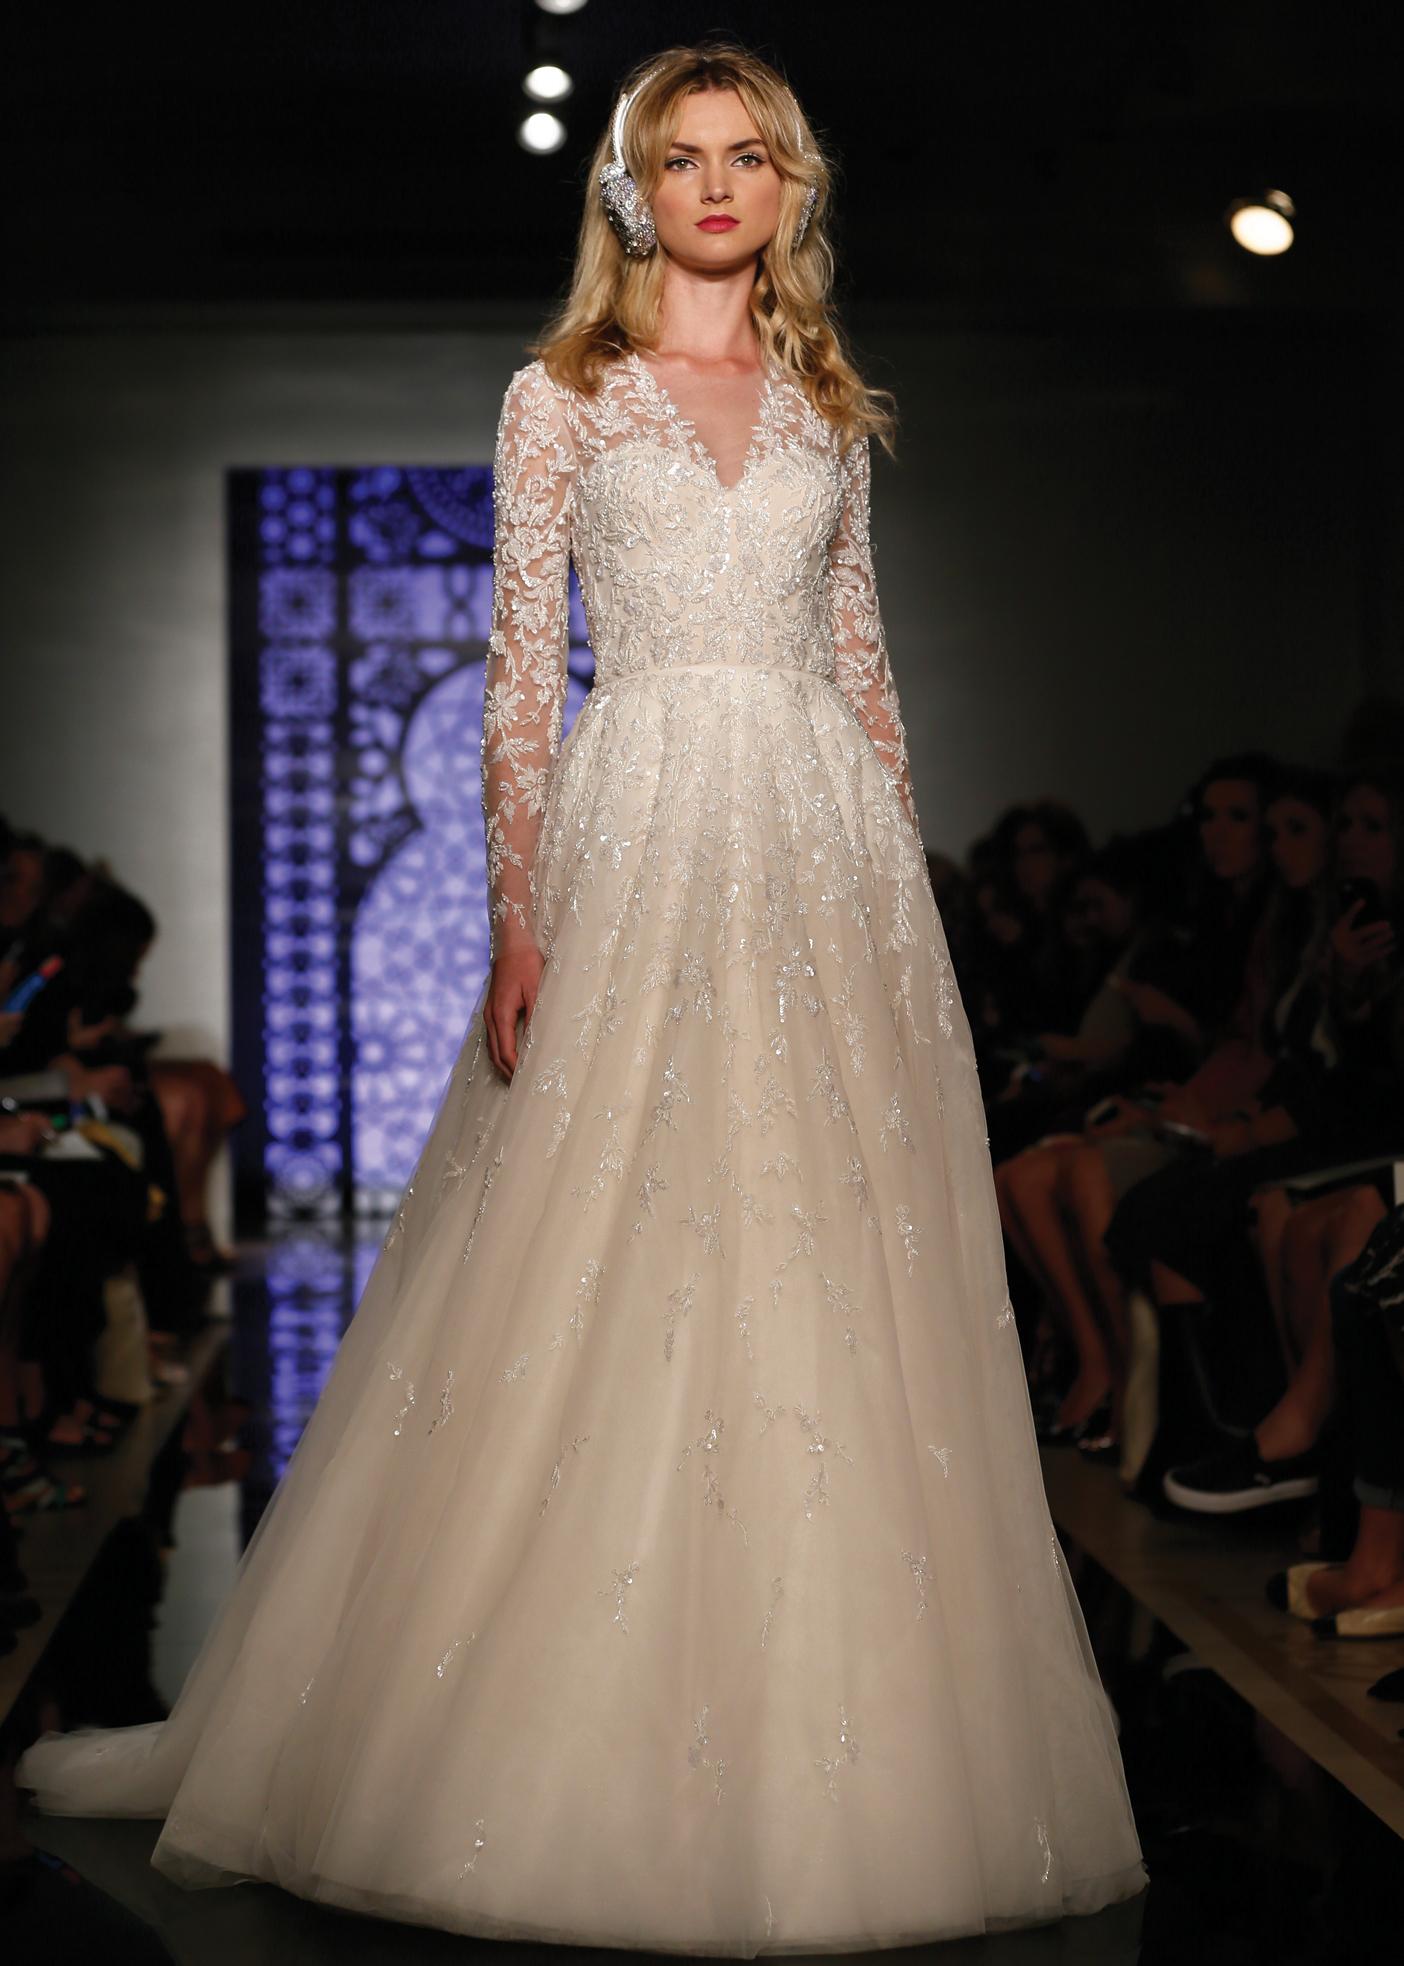 Ballgown Bridal Wedding Dress By Reem Acra In NY NJ